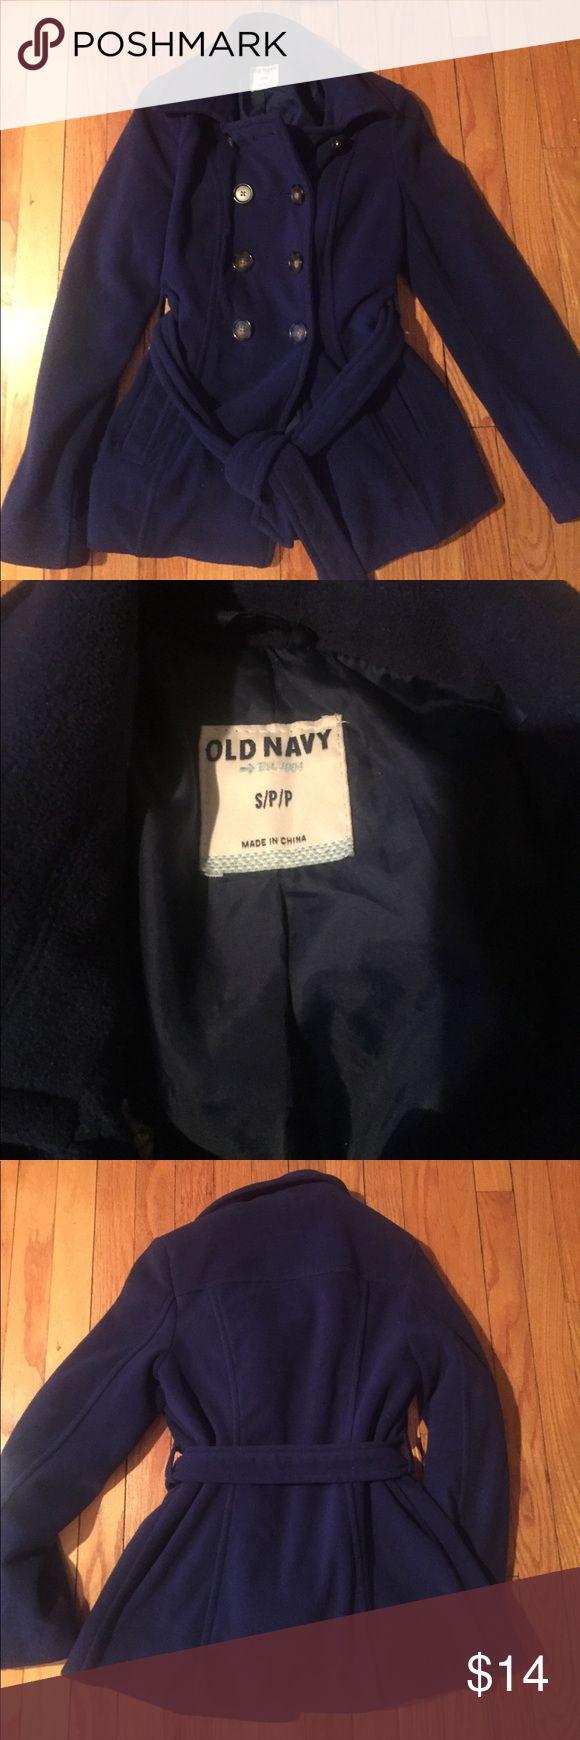 Old Navy fleece coat Cute dark Nablus coat from Old Navy.  Bottom closure. Polyester.  Machine wash cold gentle cycle. Old Navy Jackets & Coats Pea Coats